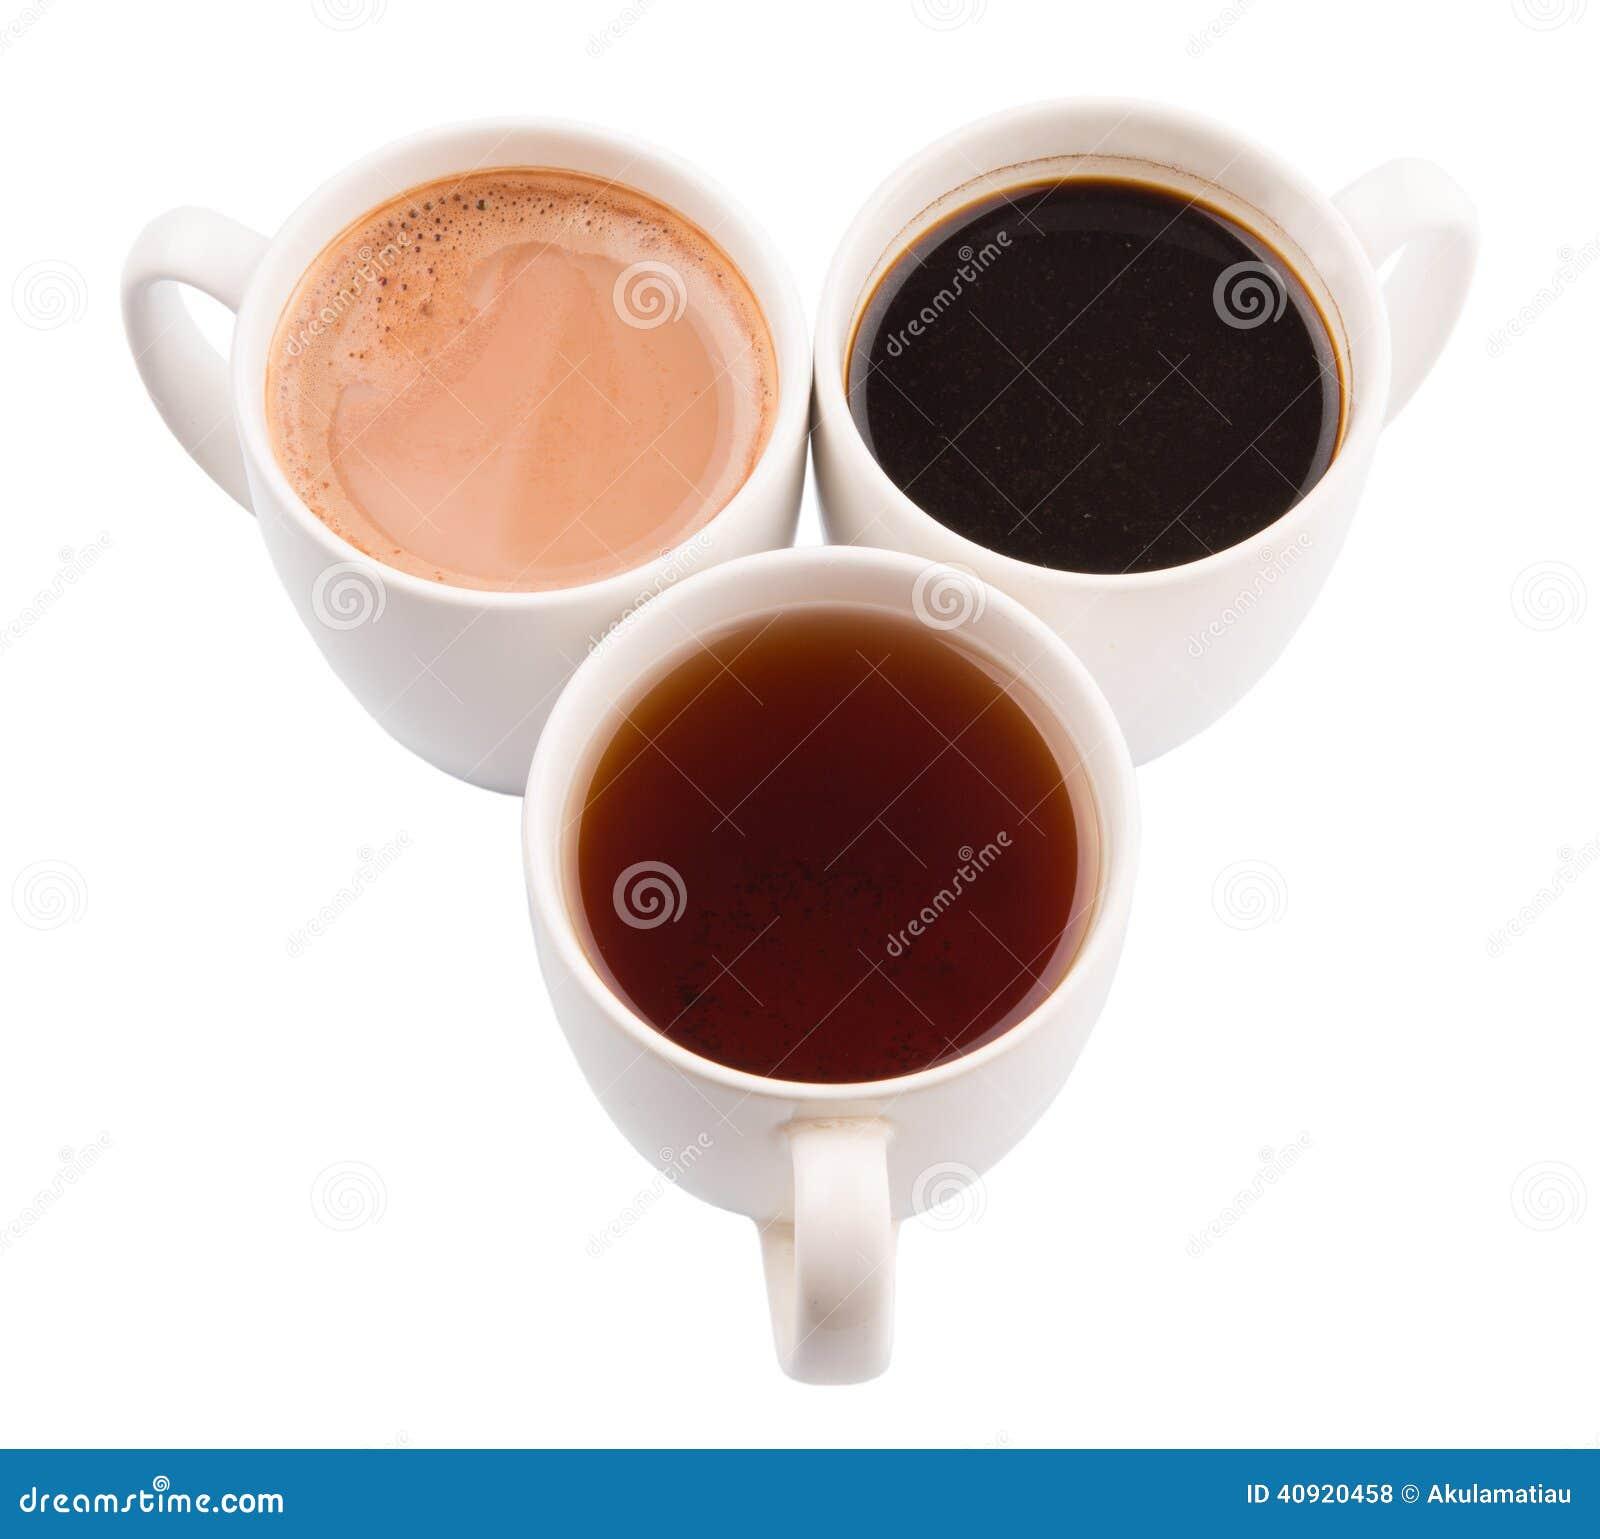 Caffeine In Hot Chocolate V In Coffee